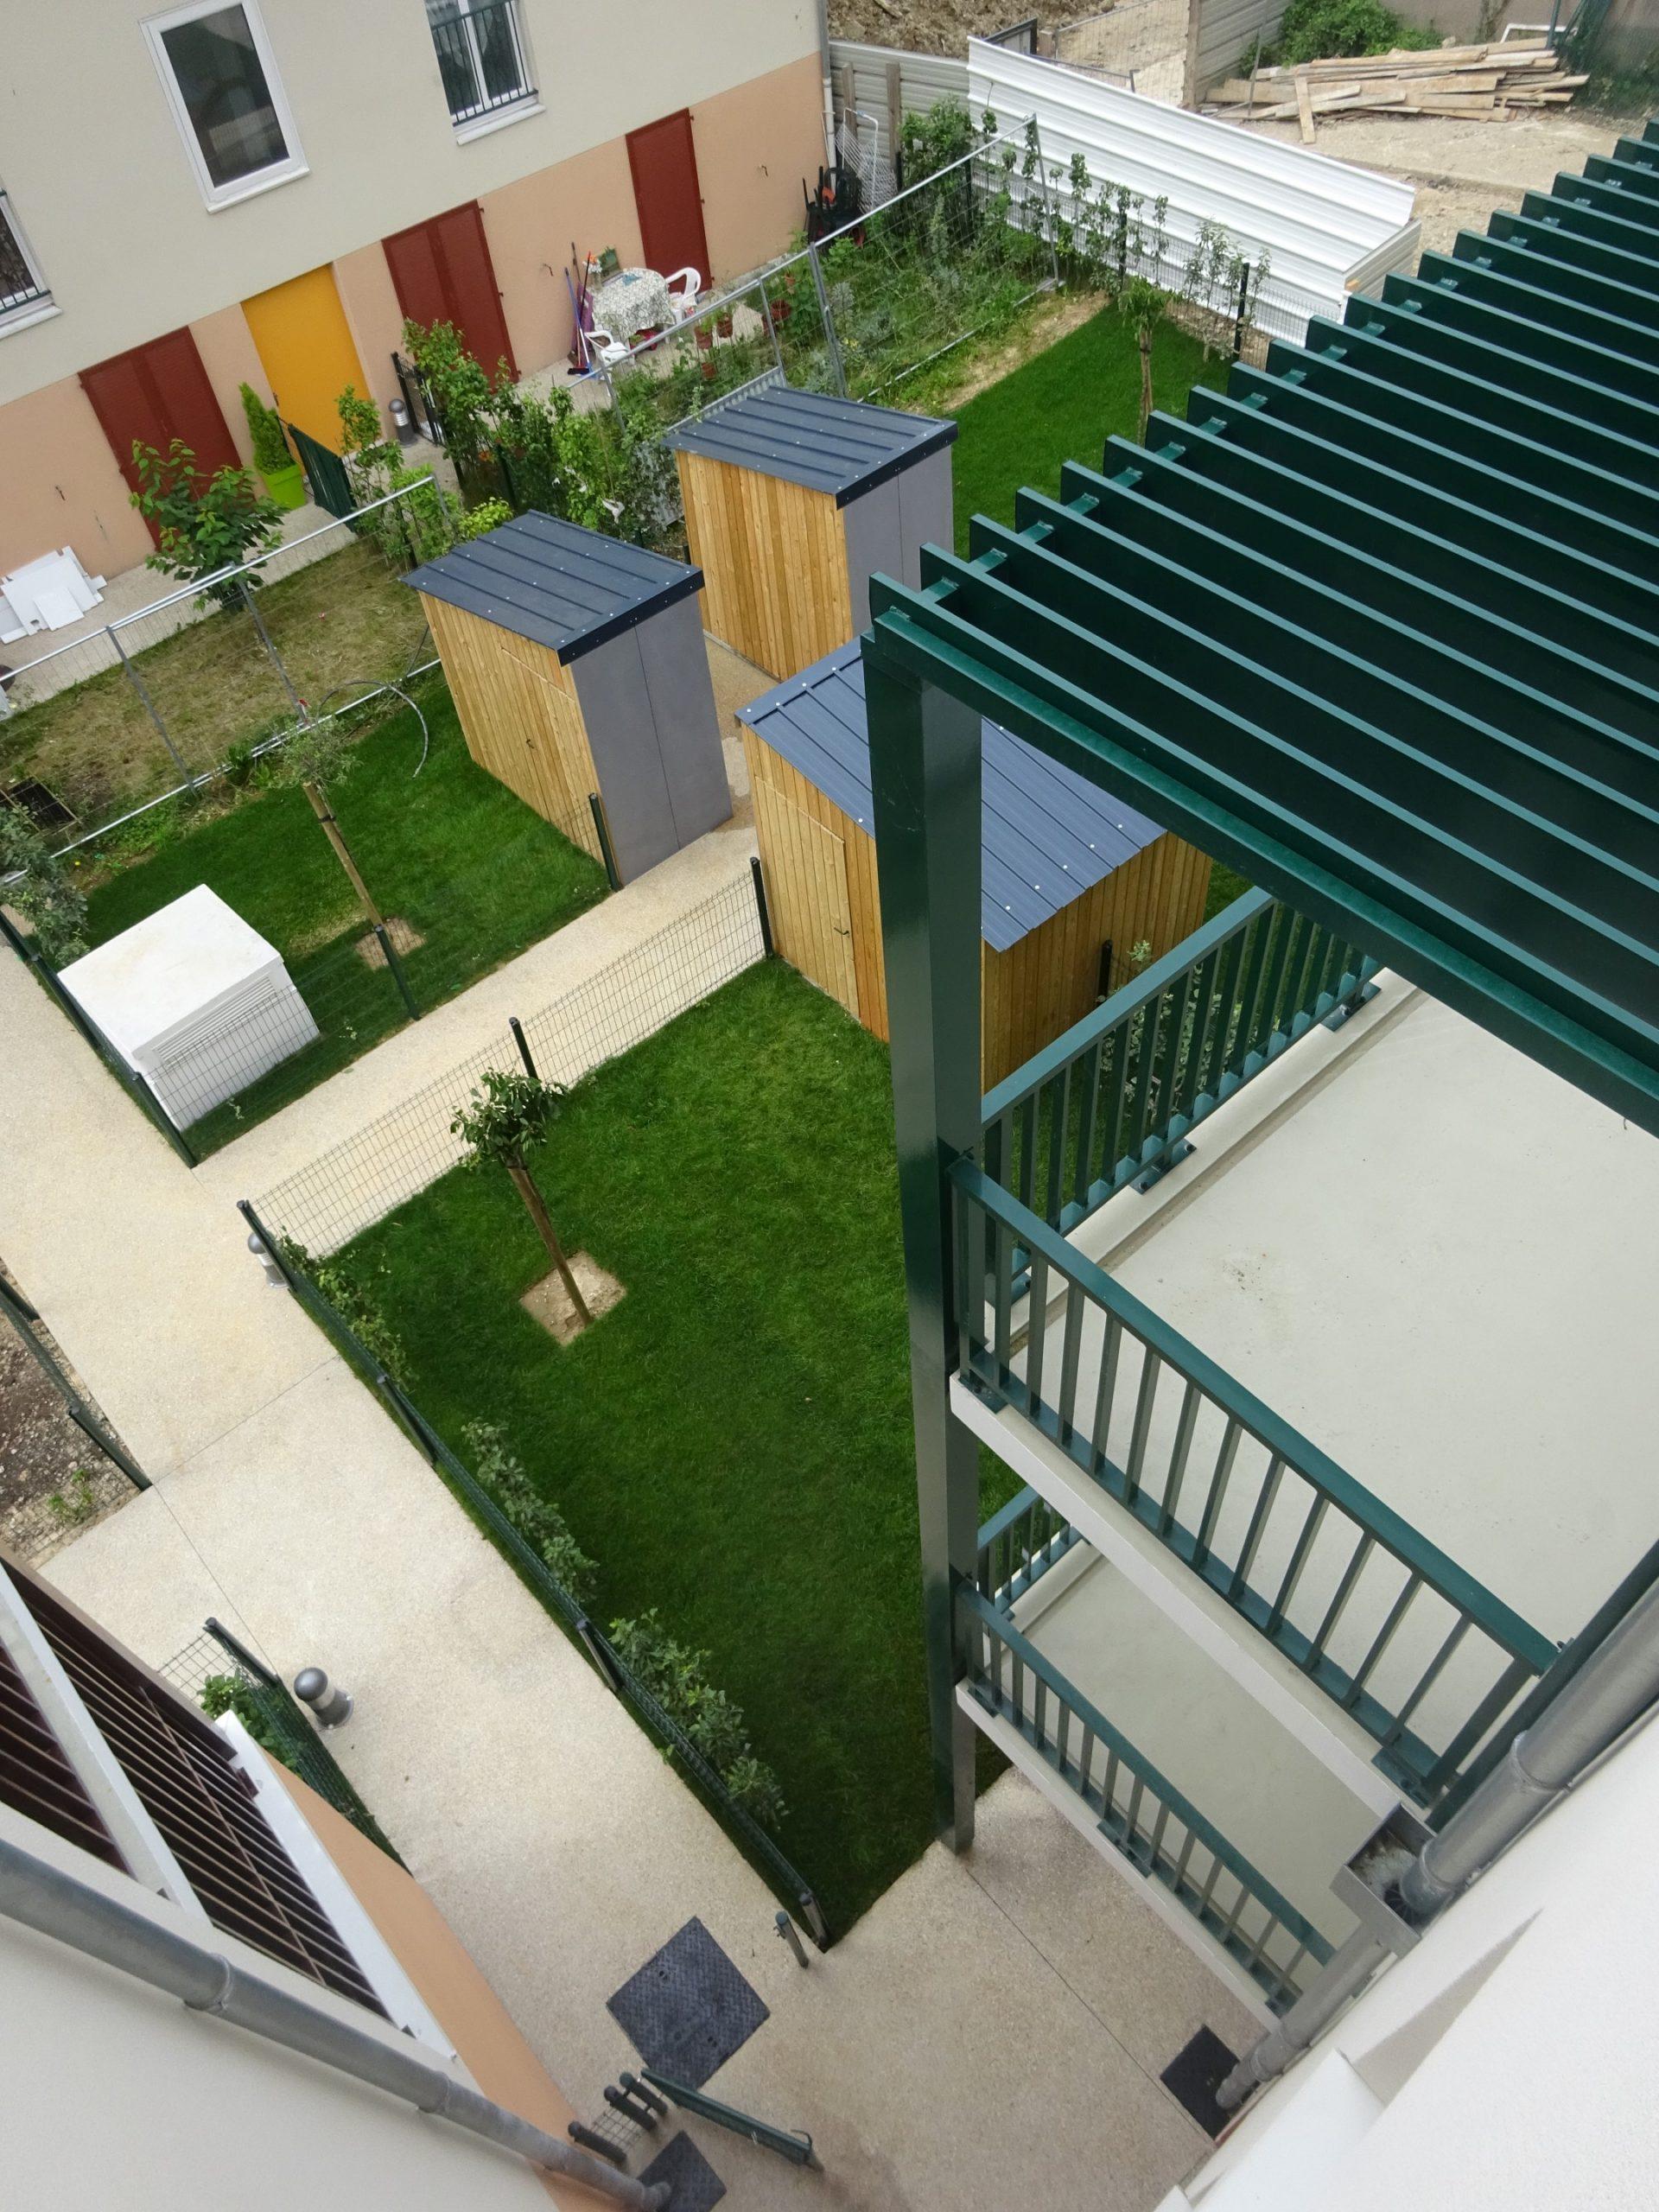 Rénovation urbaine Rosny-sous-Bois 93